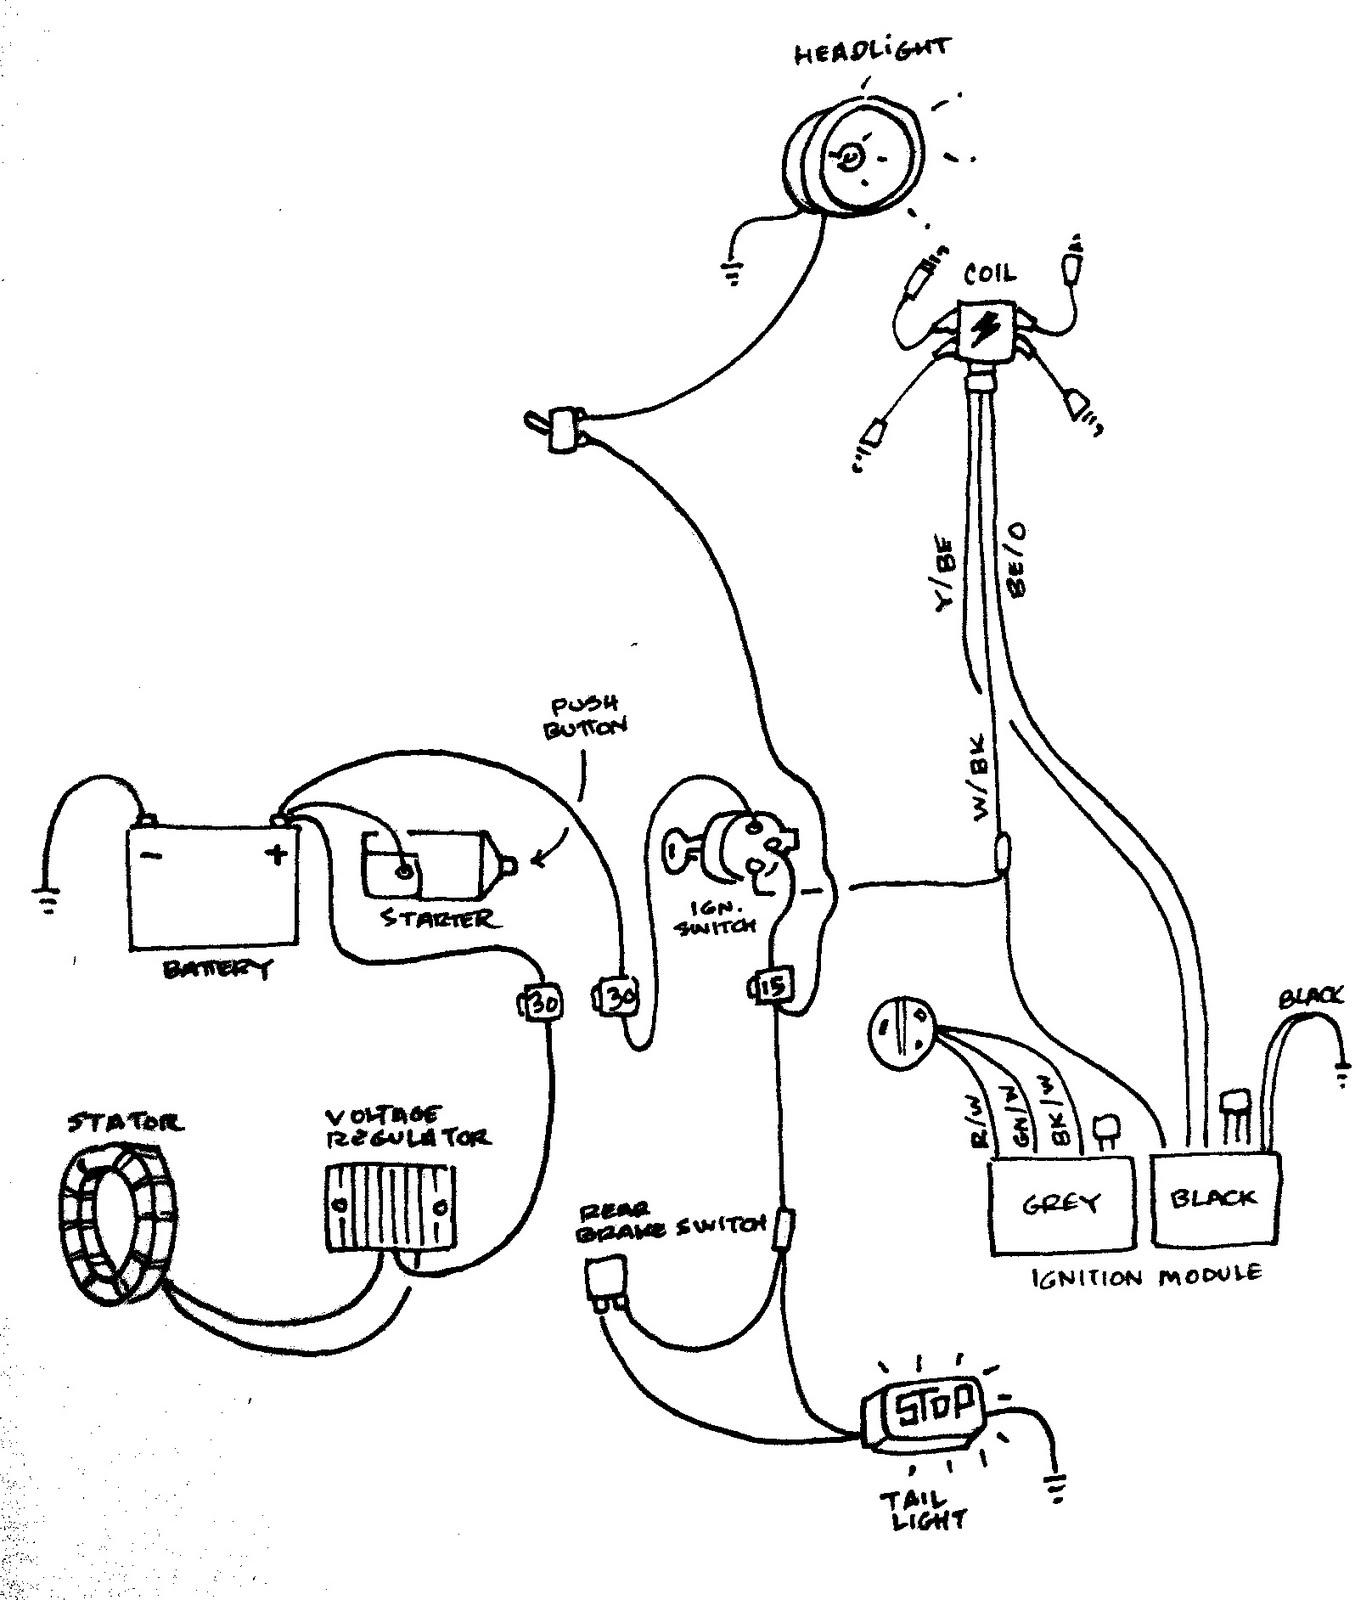 Stunning Honda Cb750 Chopper Wiring Diagram Ideas - Best Image Wire ...